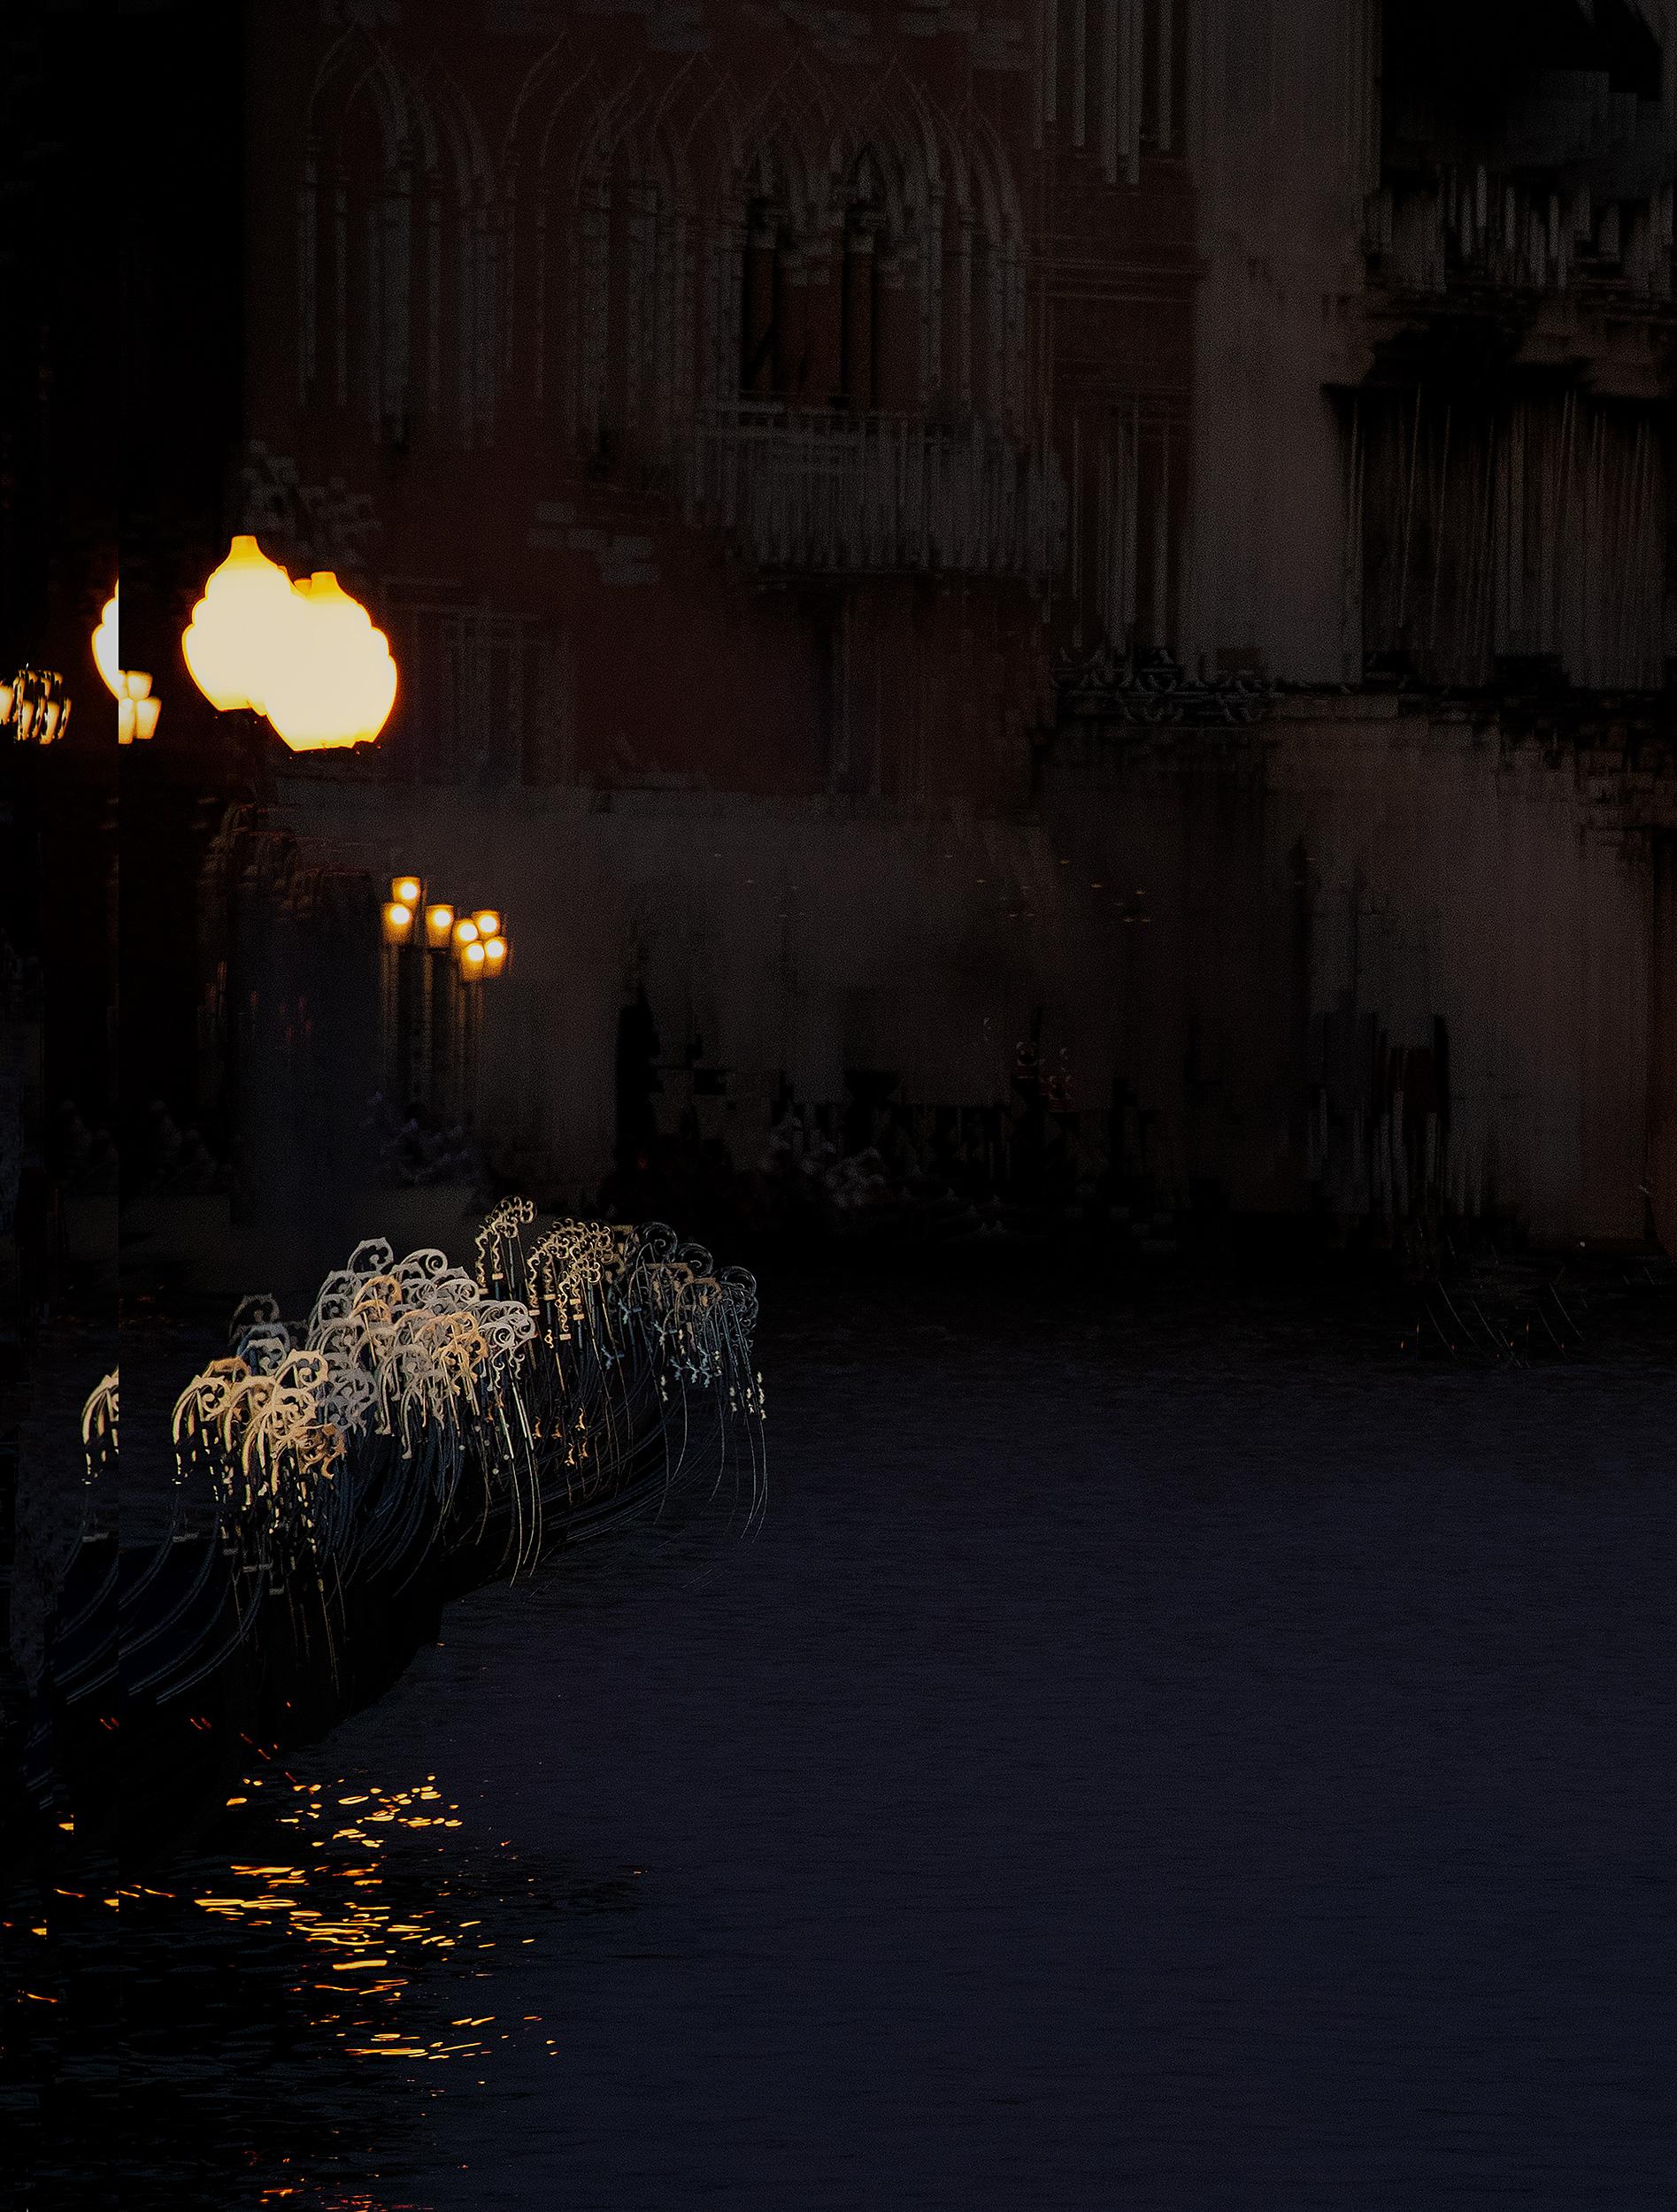 Nocturne, 'Venezia'